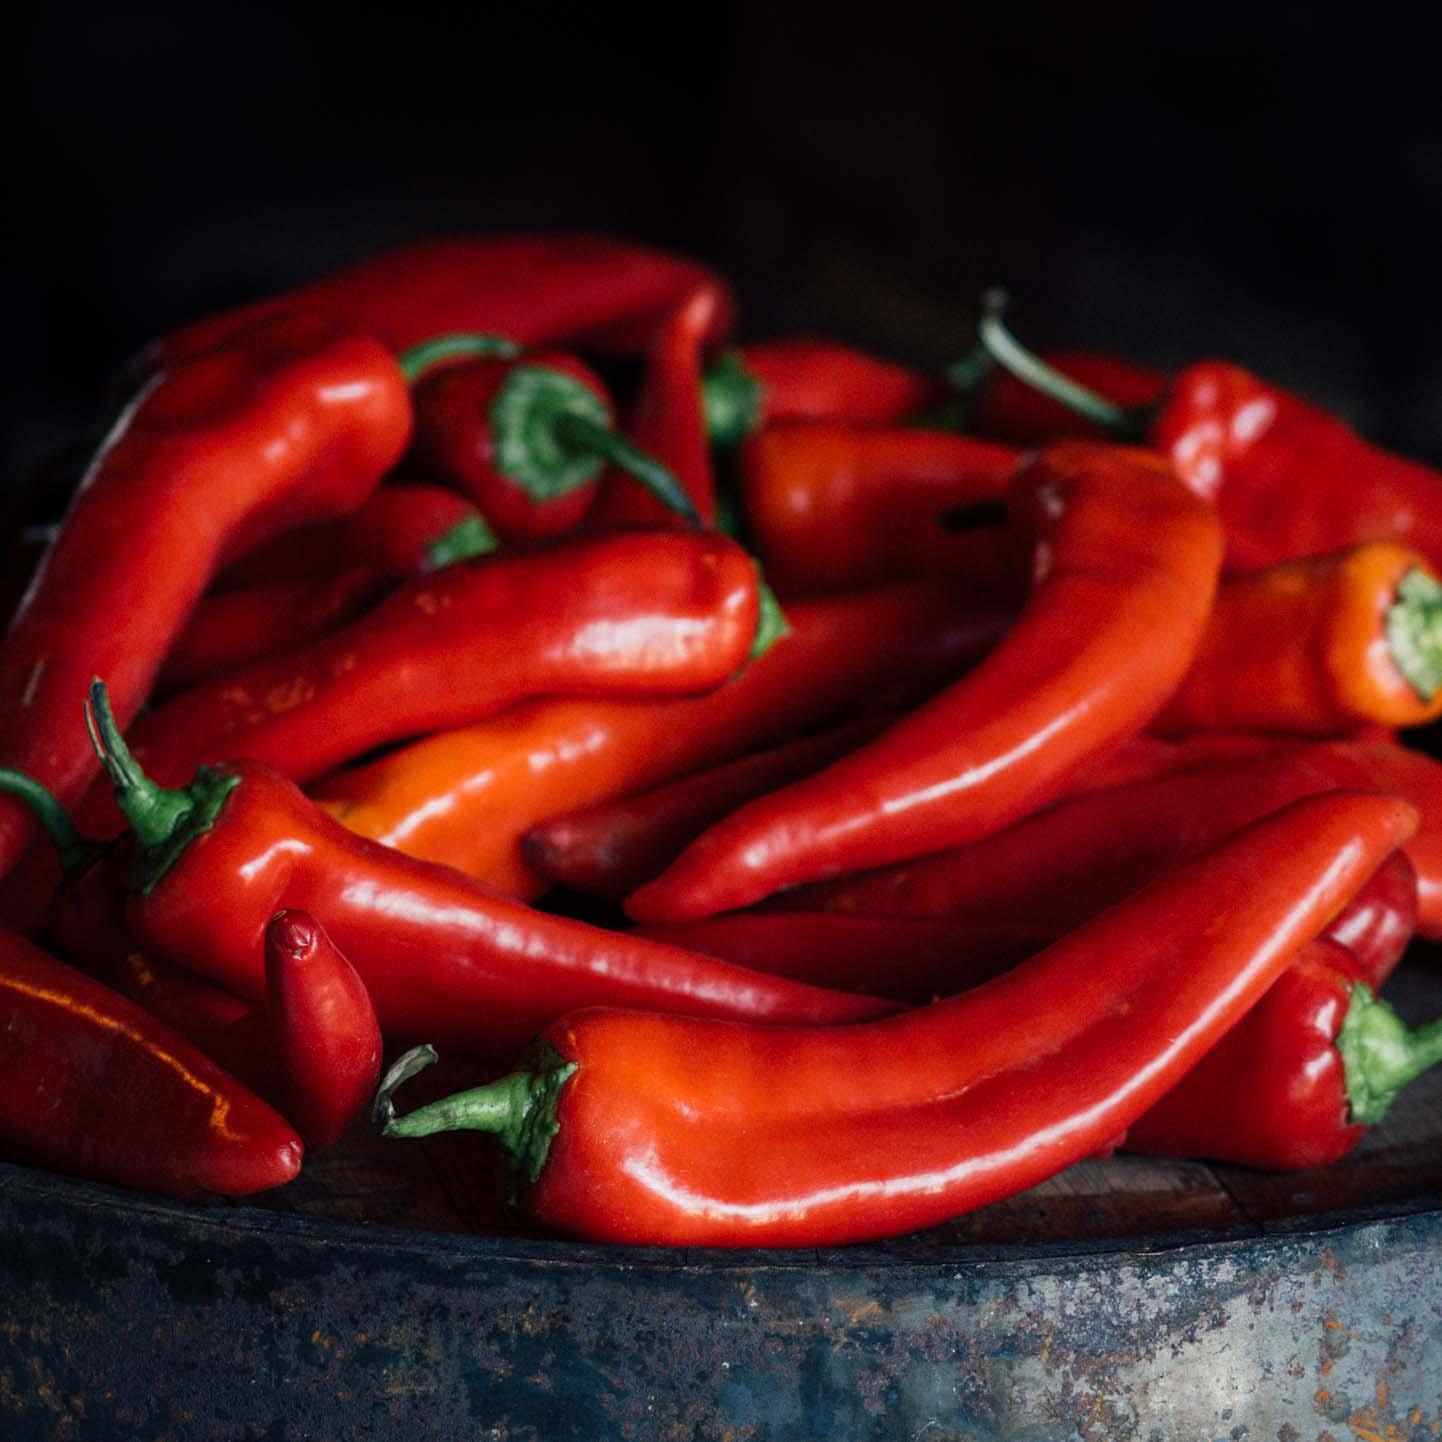 oola_hungarian_peppers-2.jpg